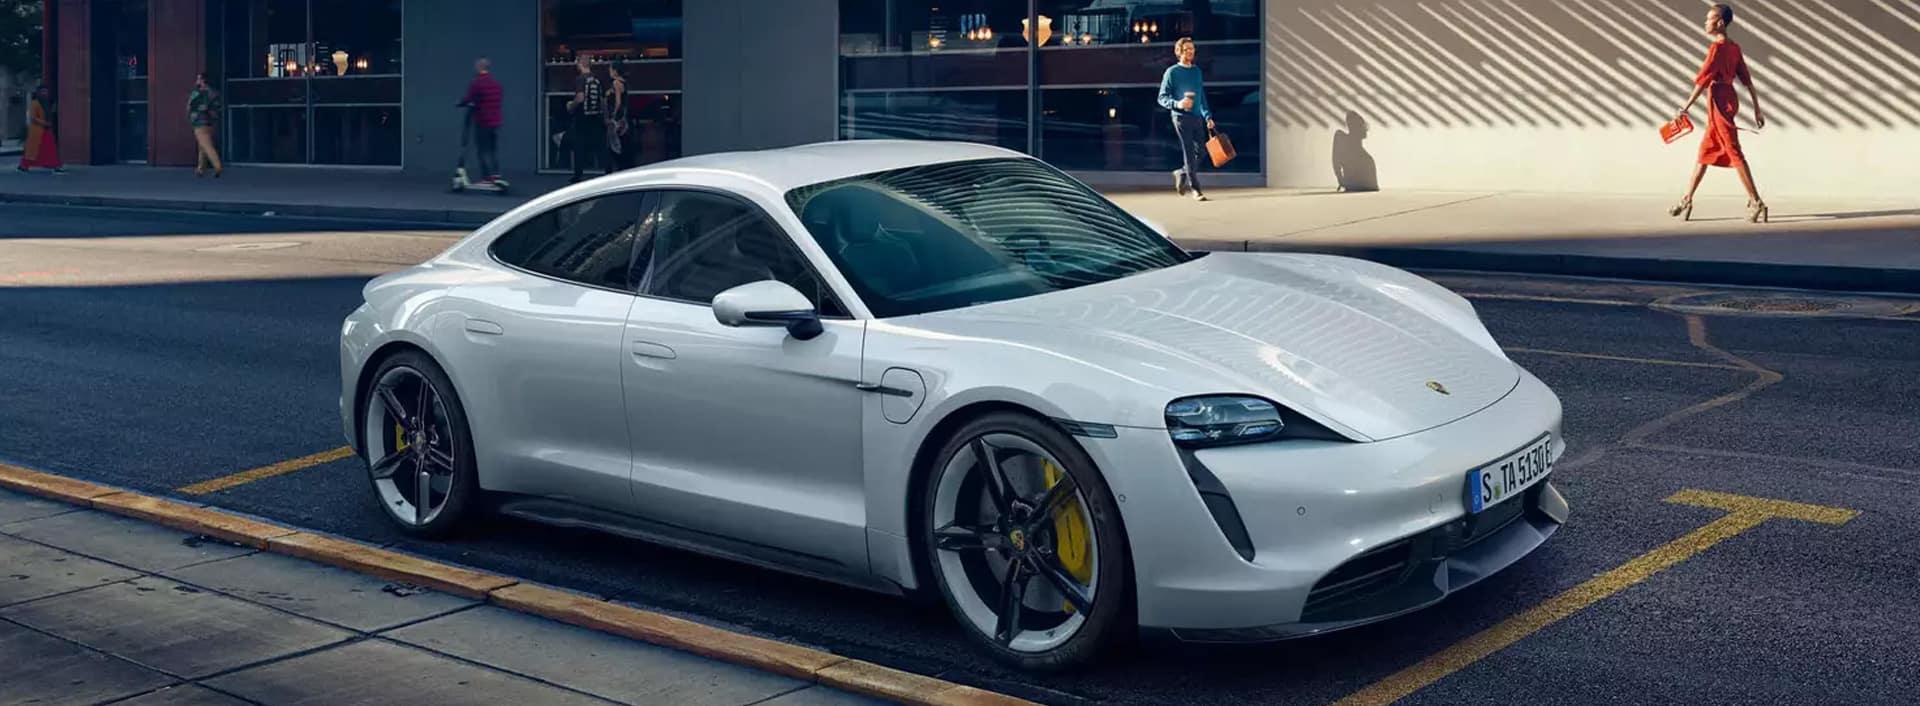 Porsche Taycan Has Arrived